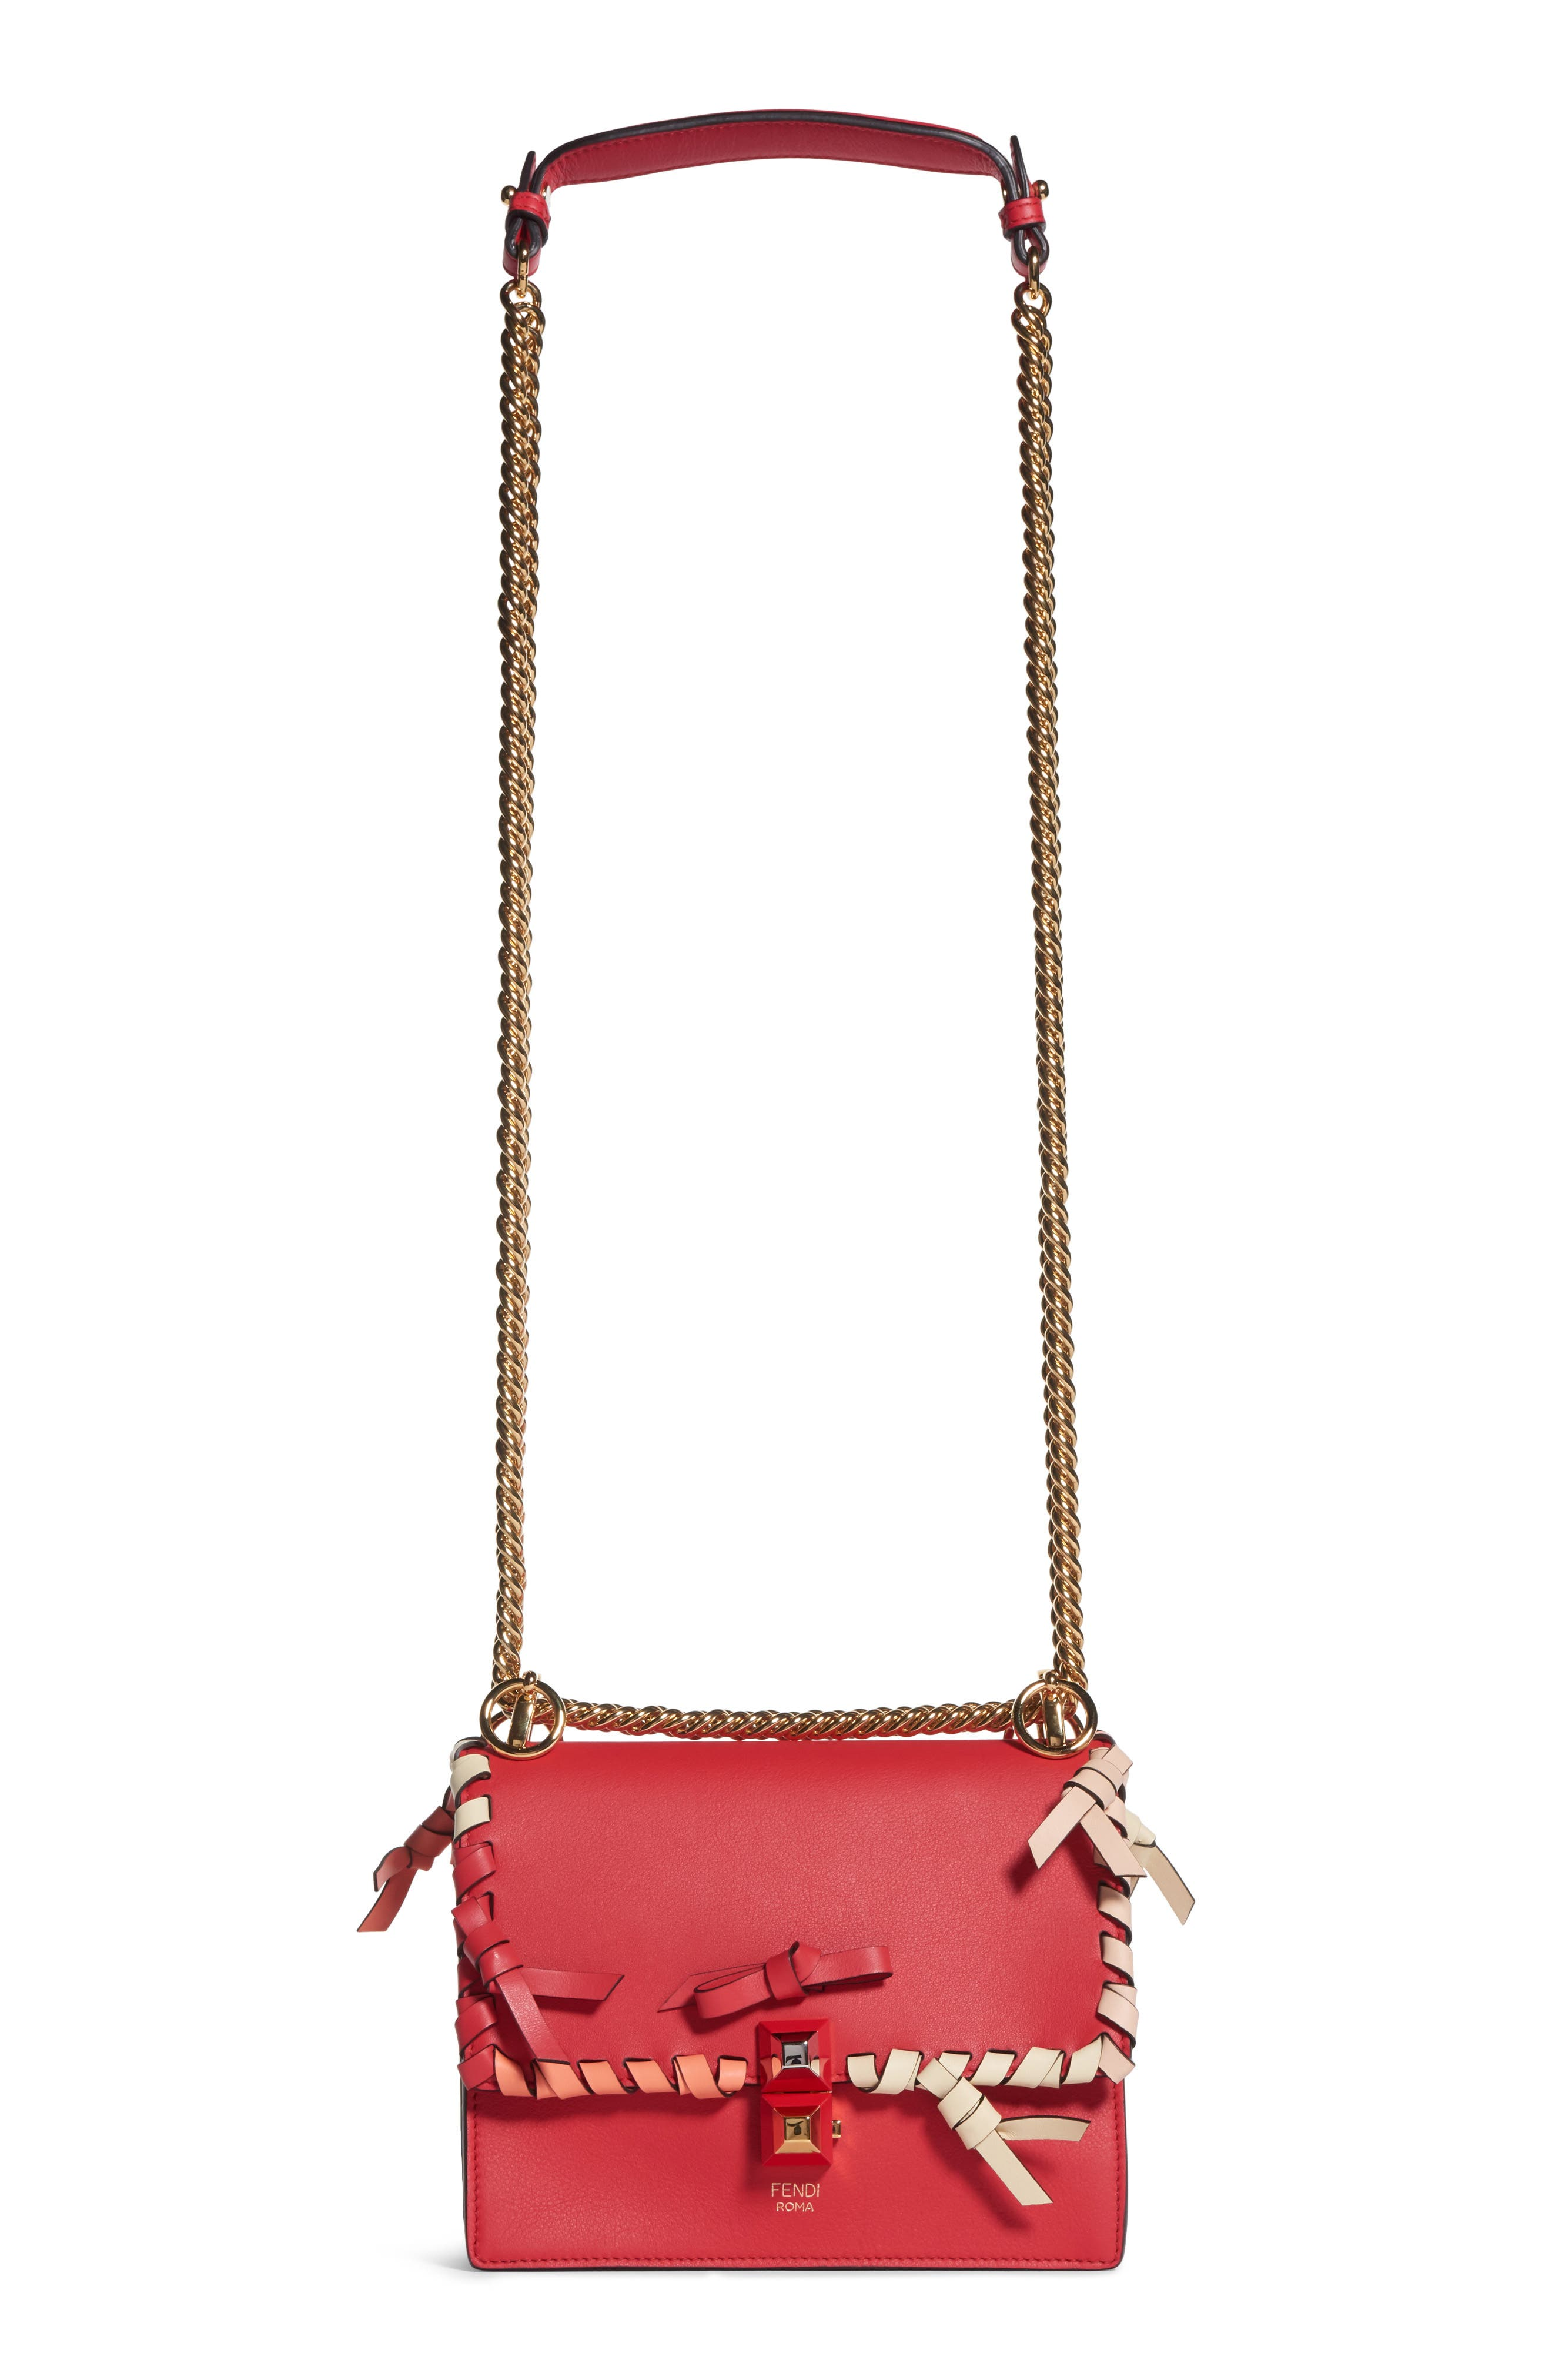 Fendi Small Kan Whipstitch Leather Shoulder Bag